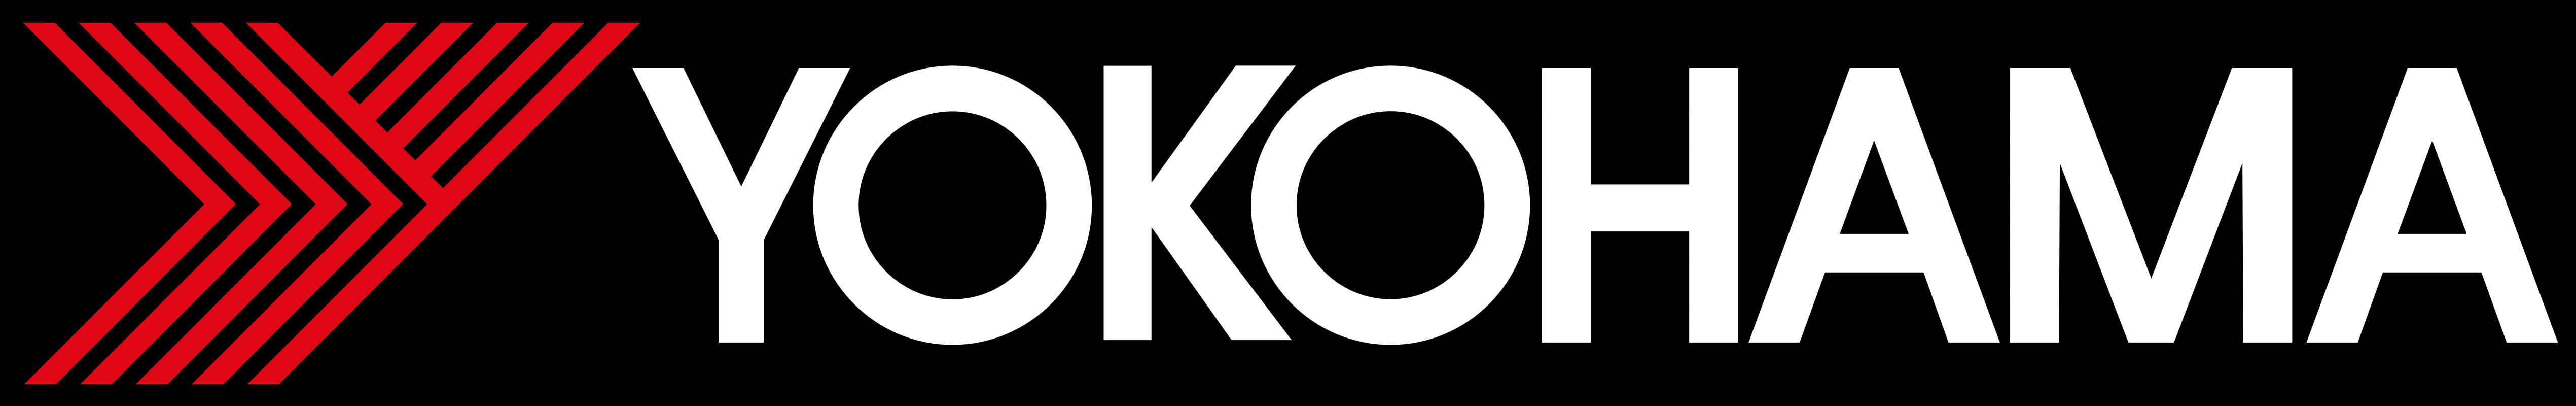 Yokohama – Logos Download